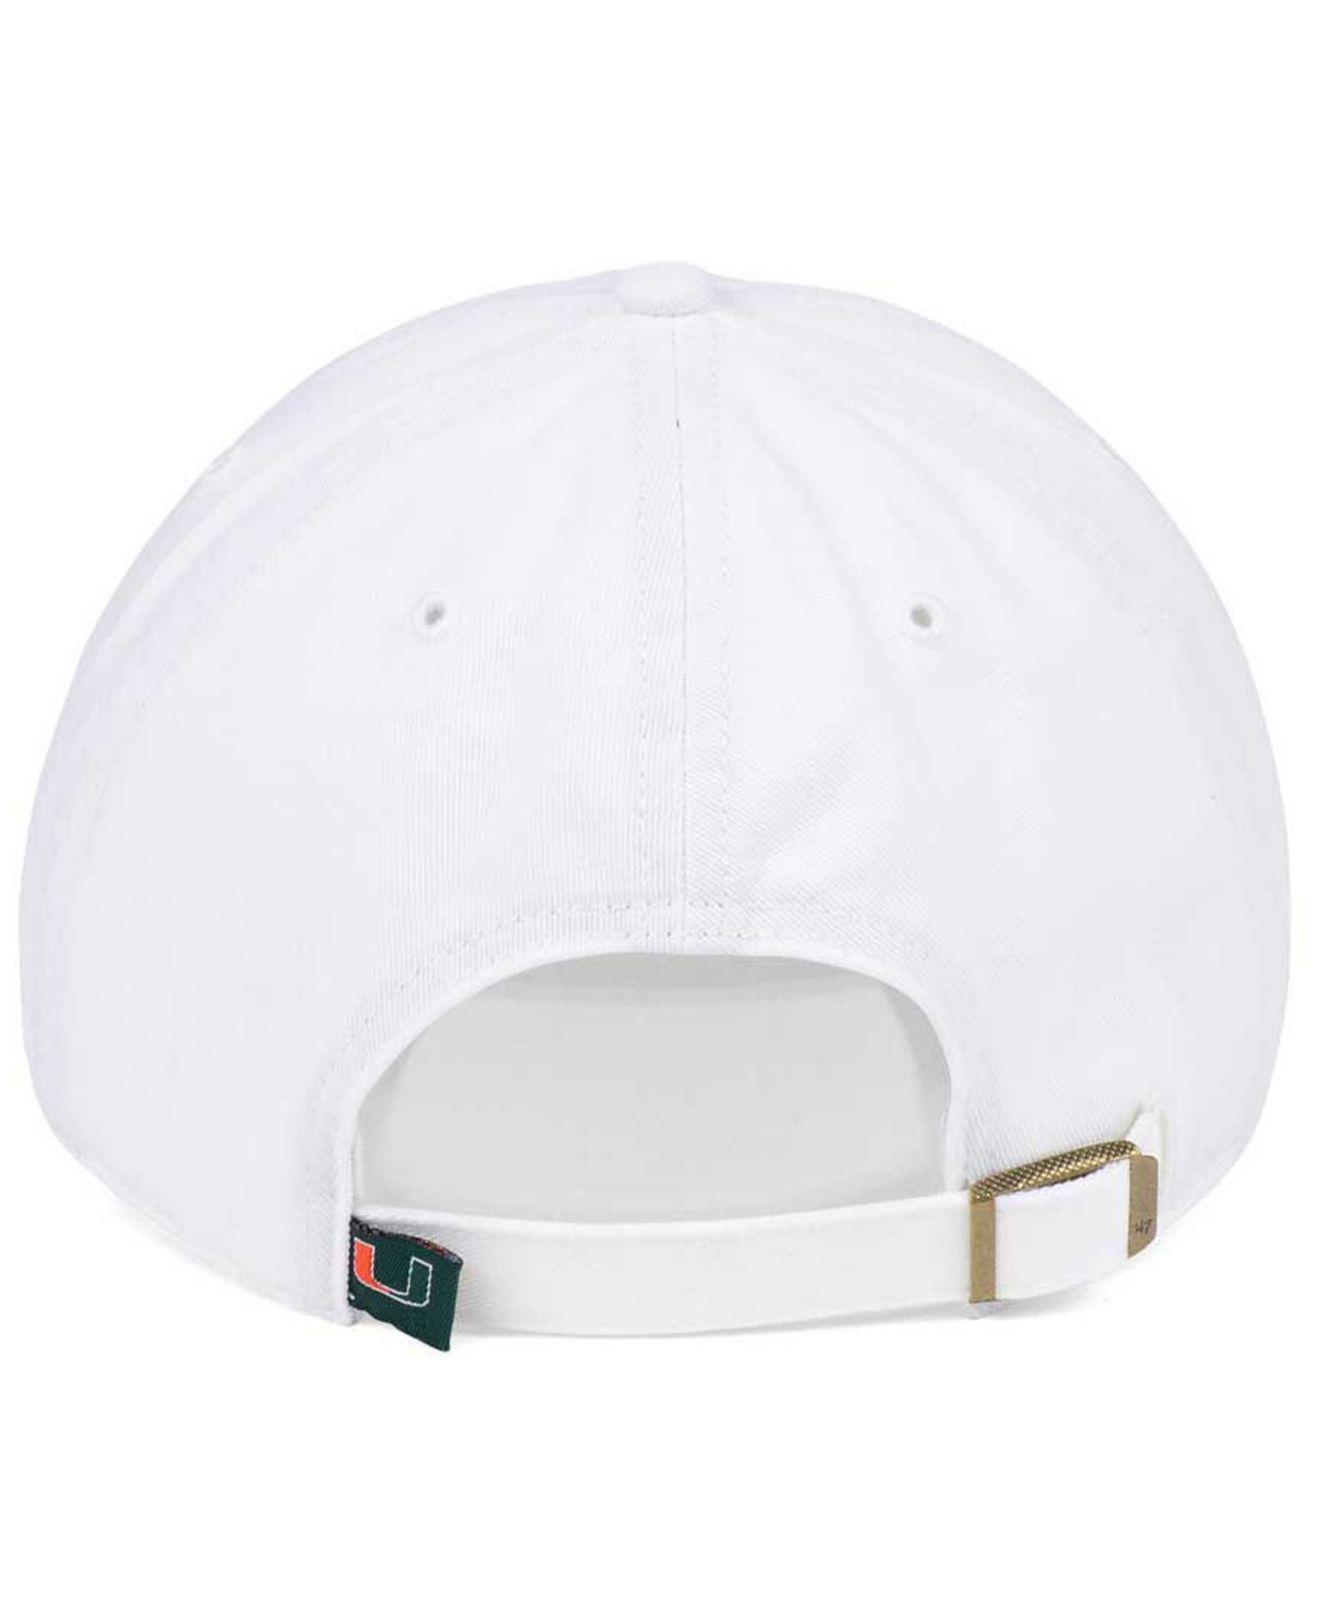 promo code 2babd 20338 ... hot purchase 47 brand white miami hurricanes clean up cap for men lyst.  view fullscreen